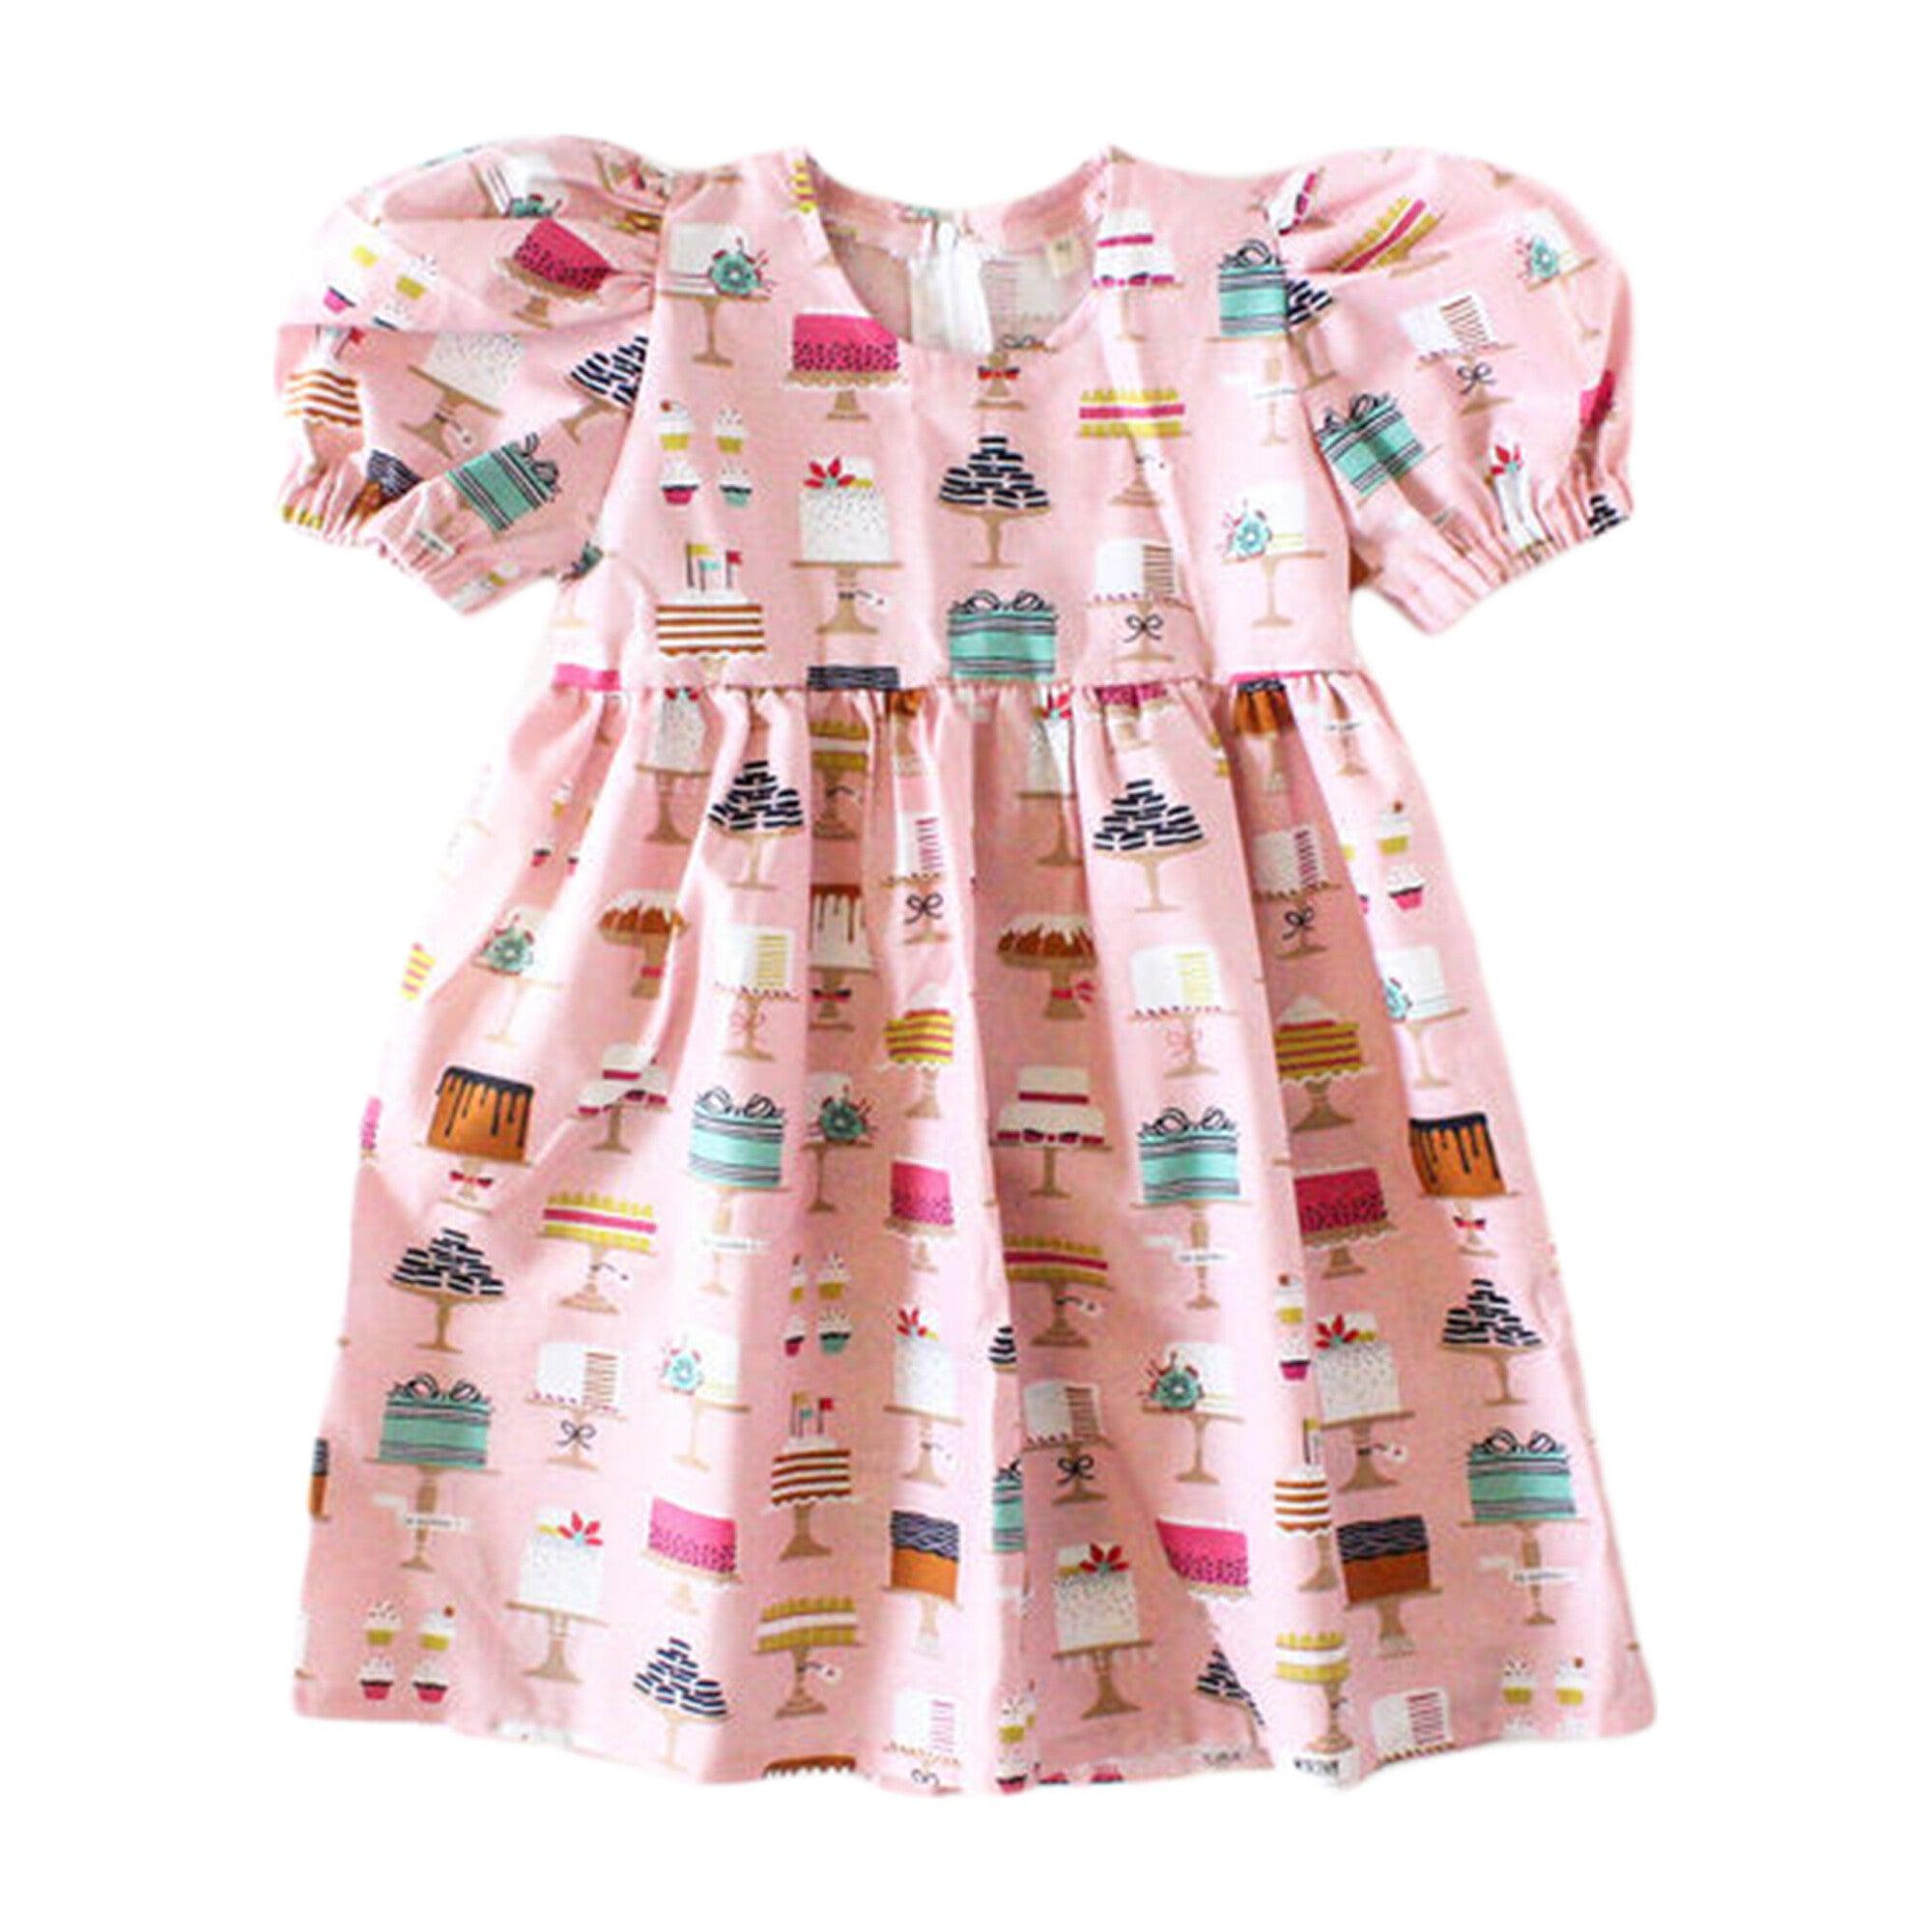 Puff Sleeve Dress, Made From Scratch